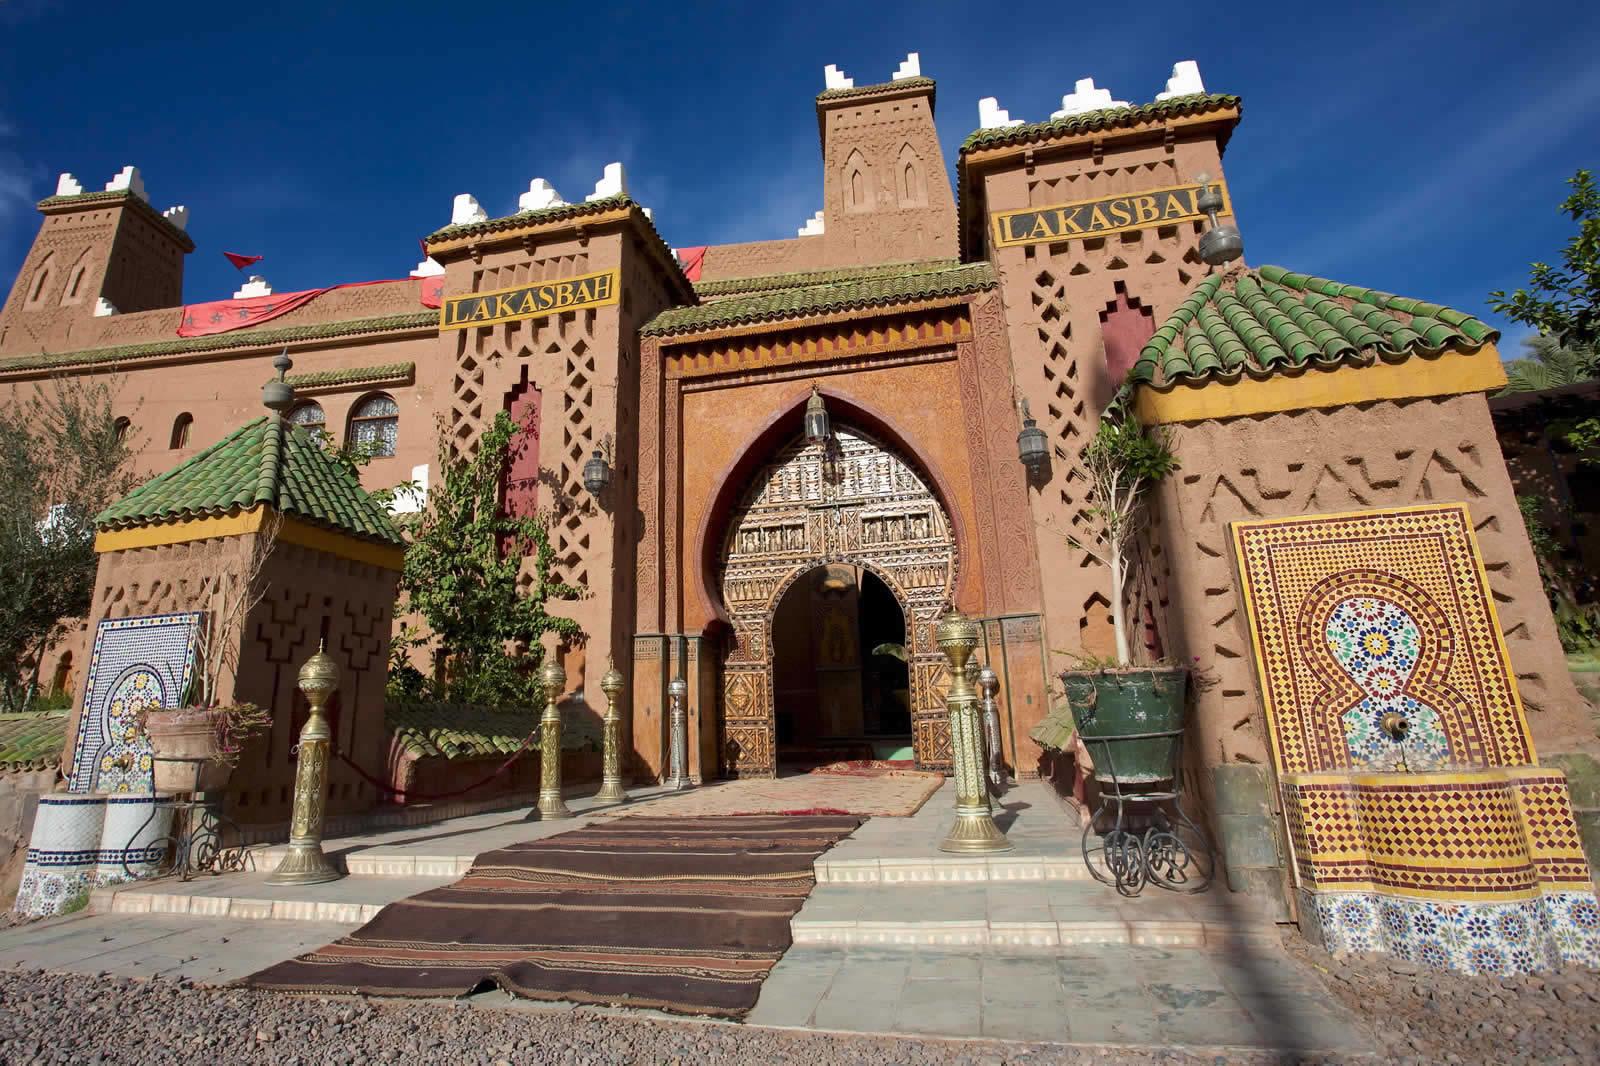 acheter-un-riad-investissement-immobilier-maroc